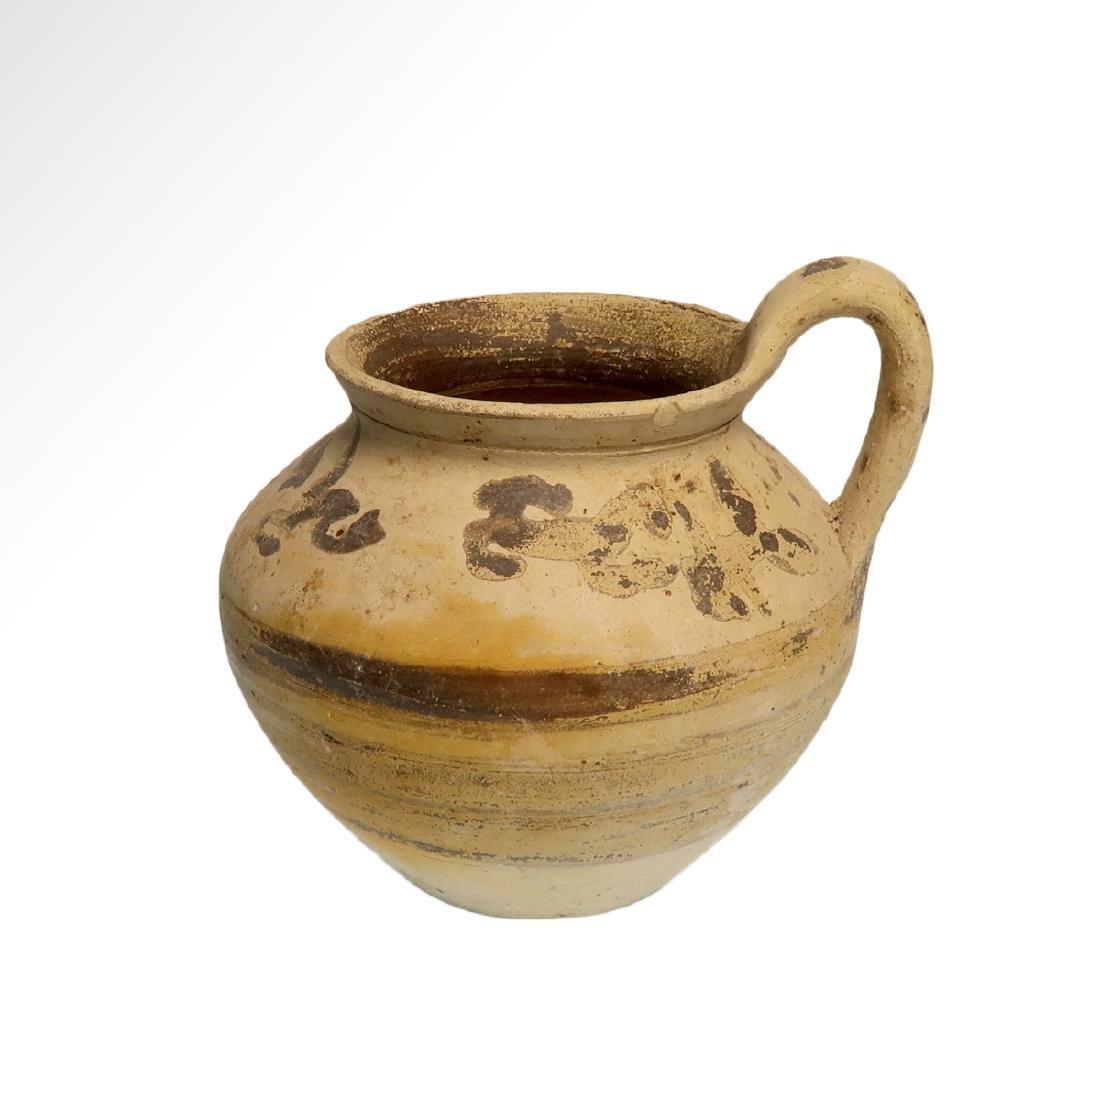 Greek Daunian Jug, c. 4th century B.C.